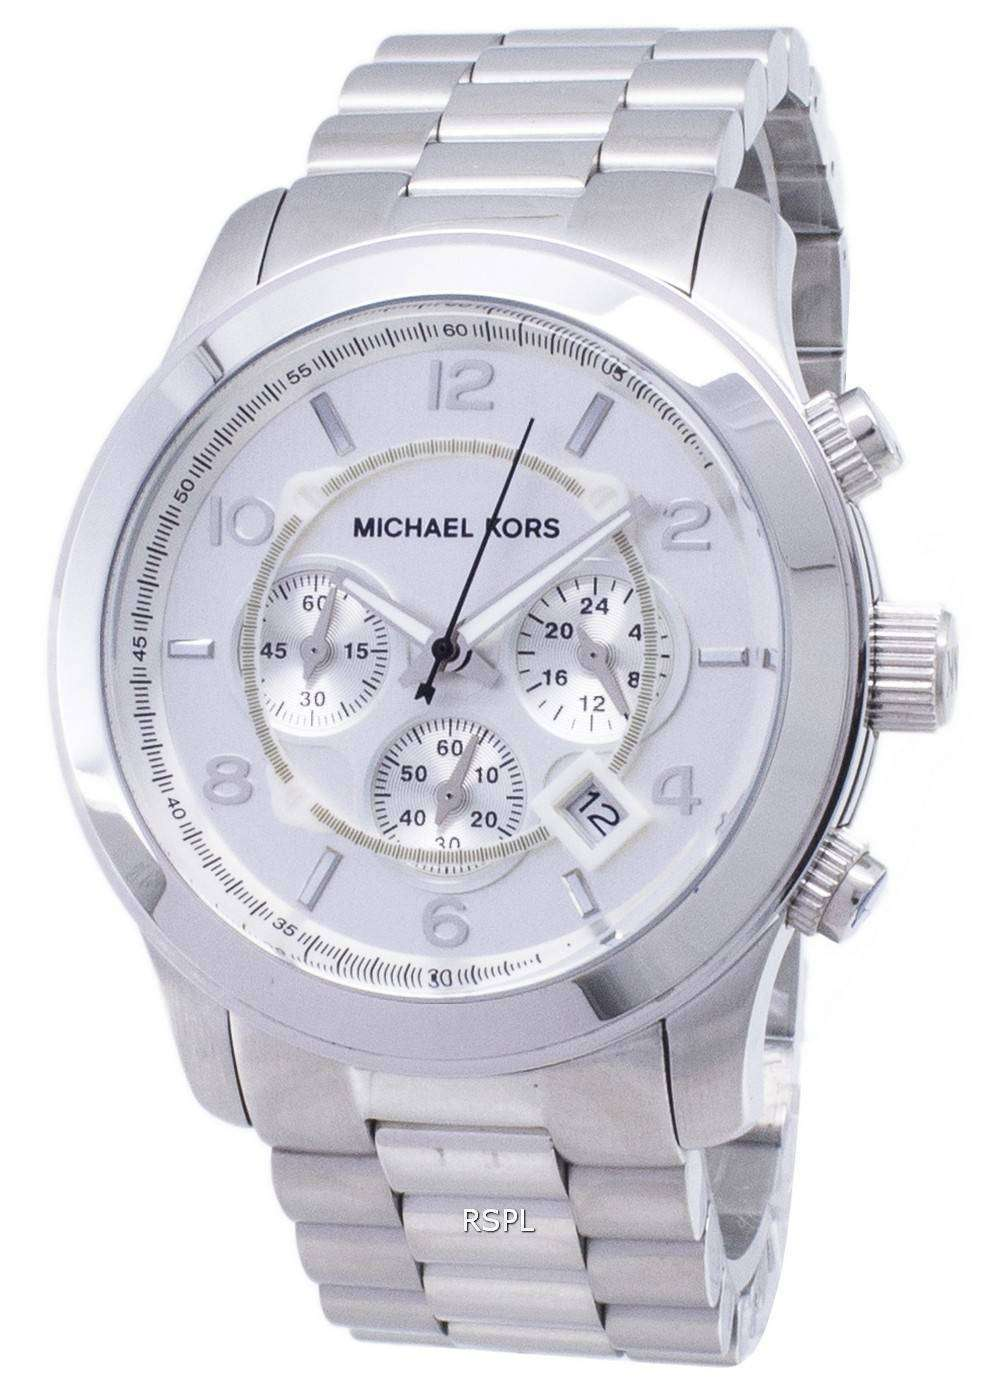 Michael Kors Watches for Men | Nordstrom